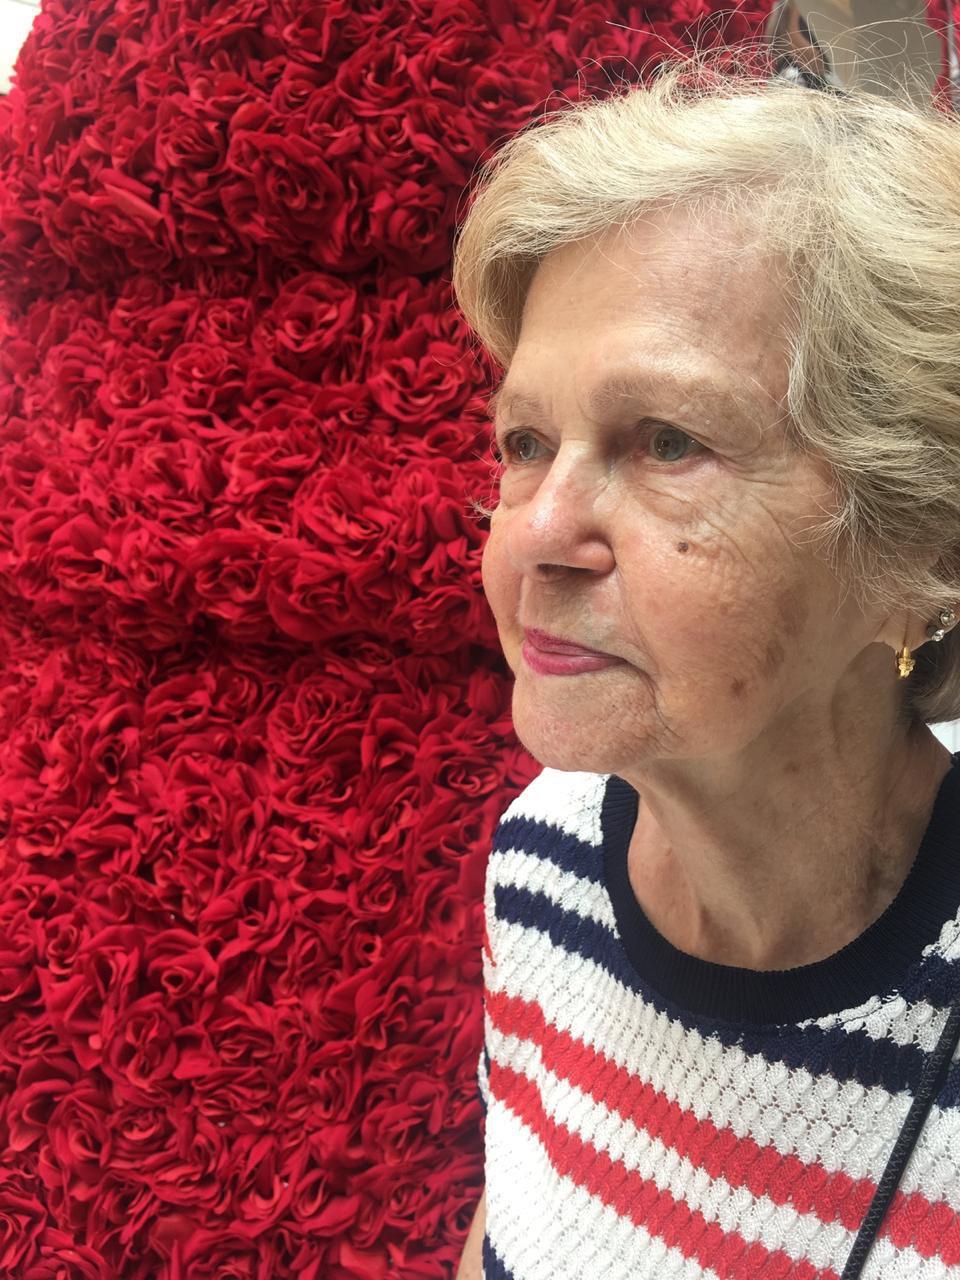 Mariana de Oliveira, 89